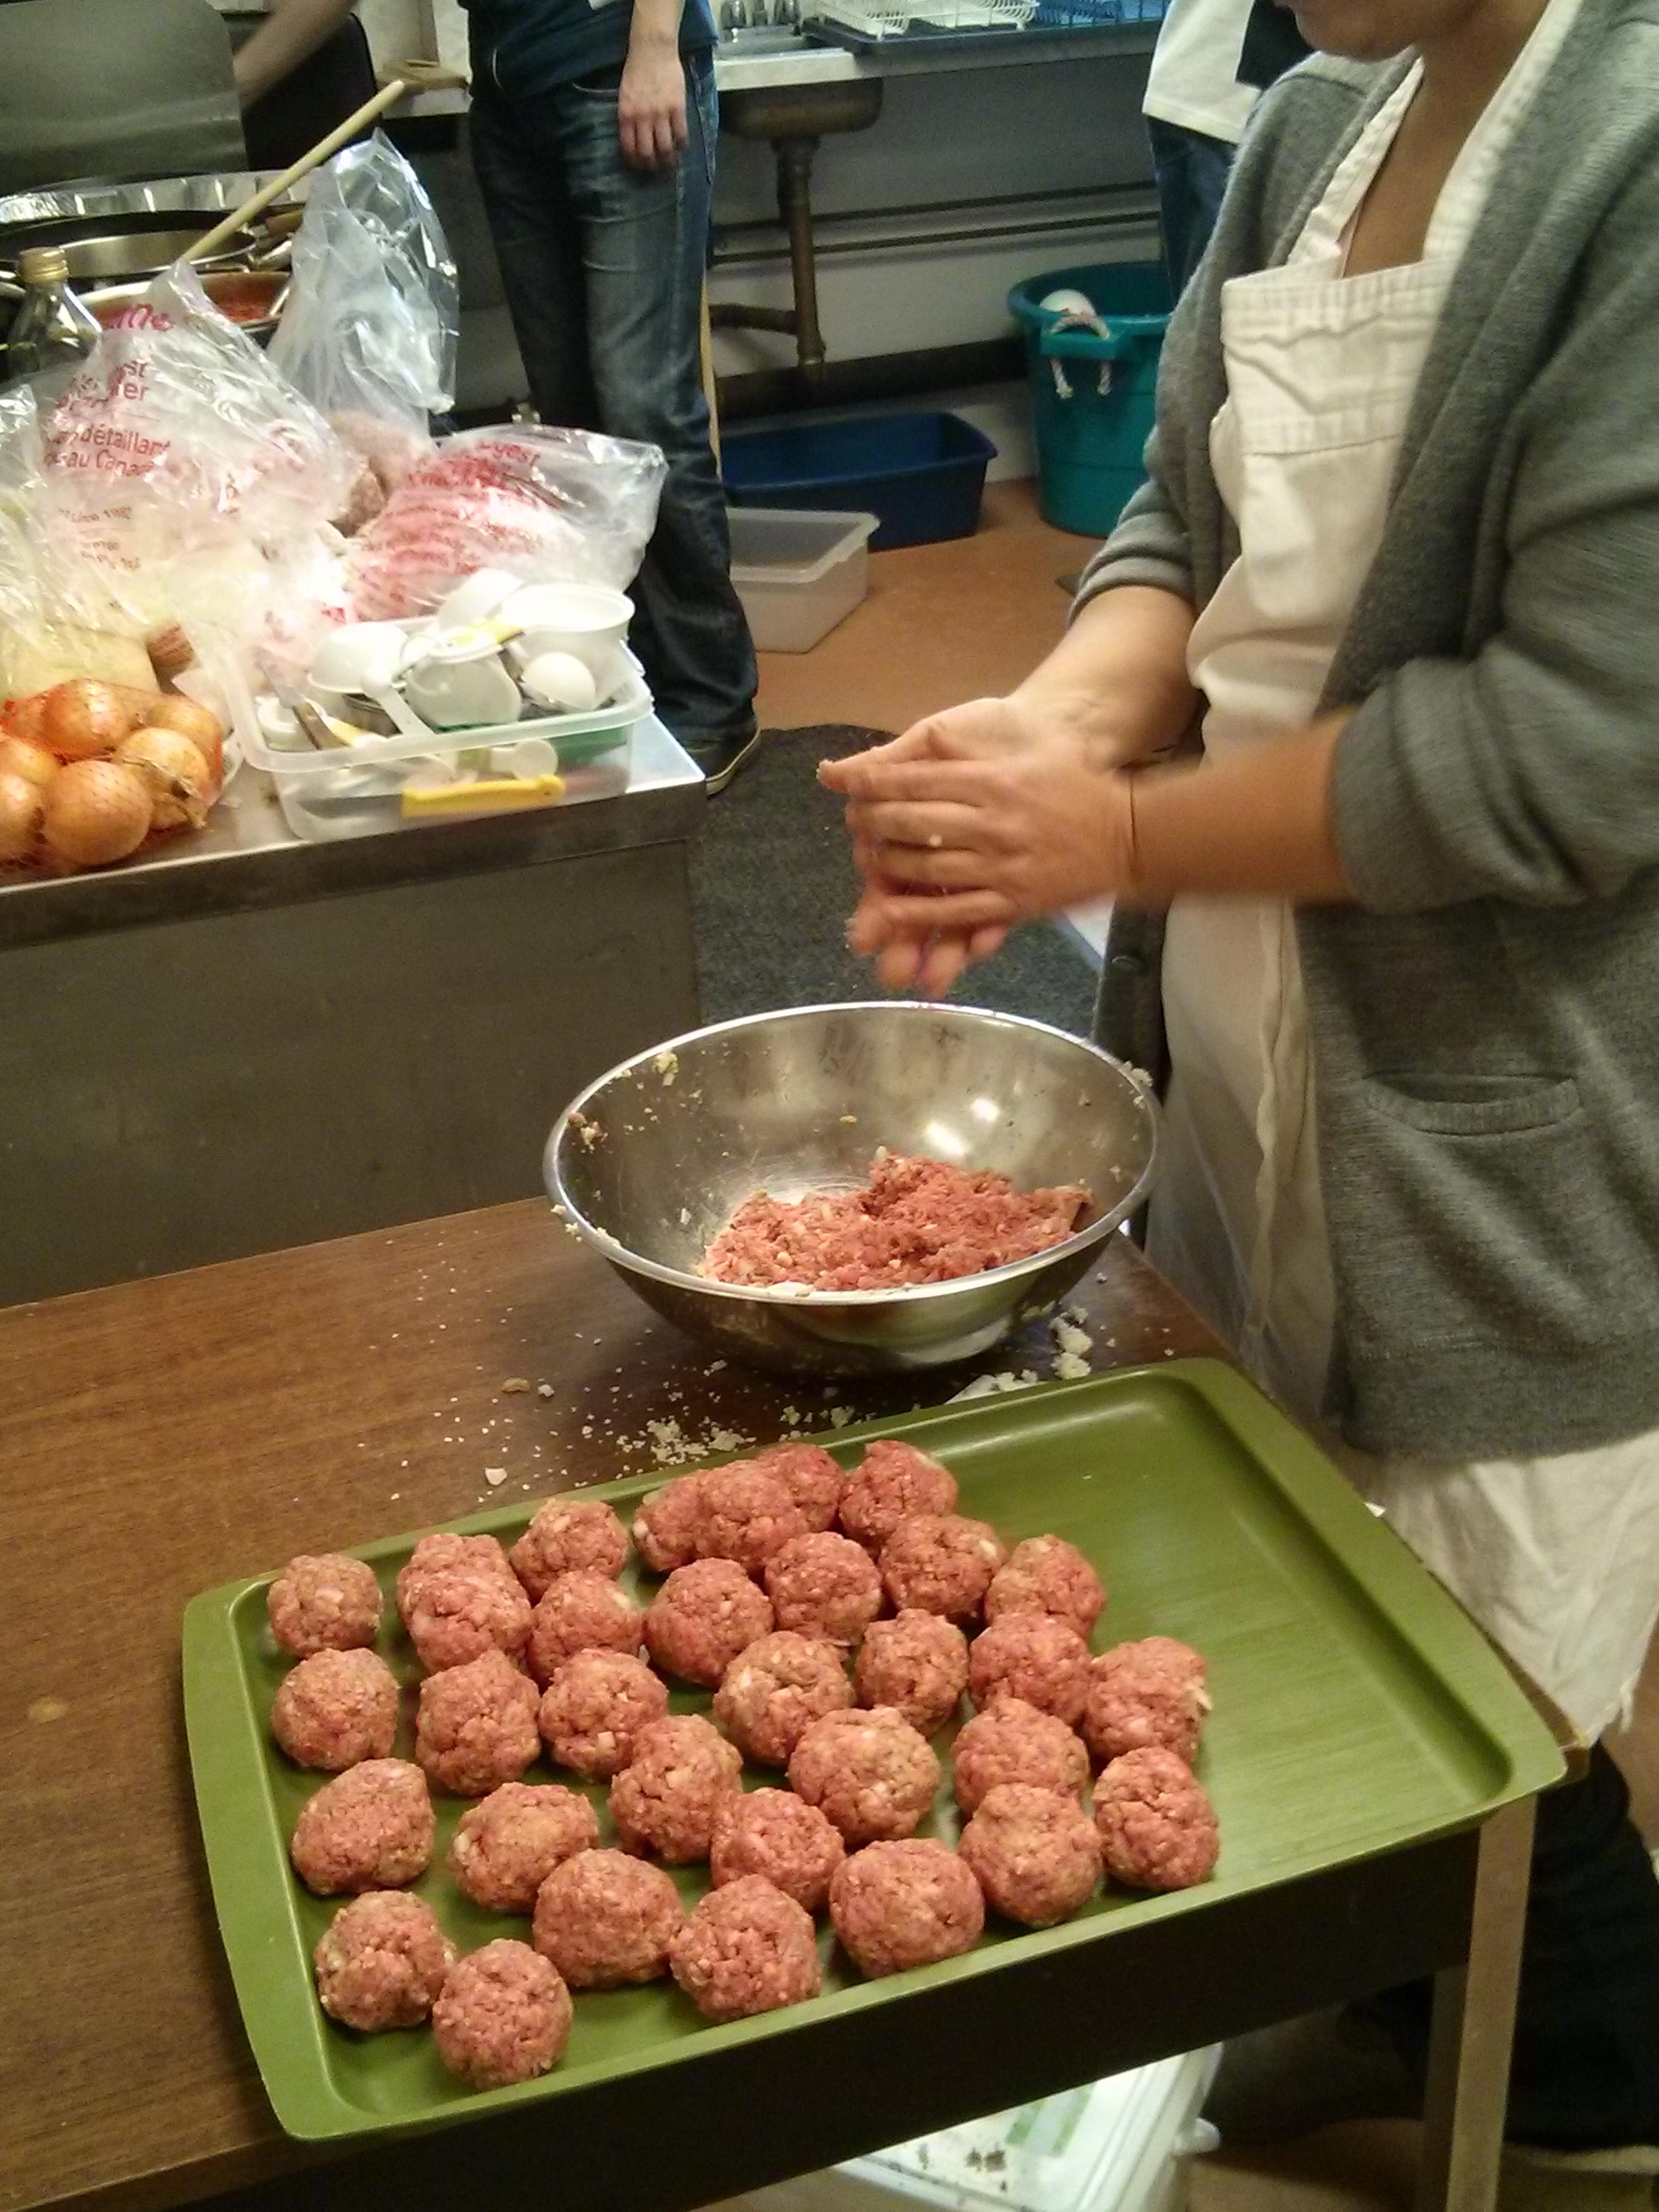 Meatball Production